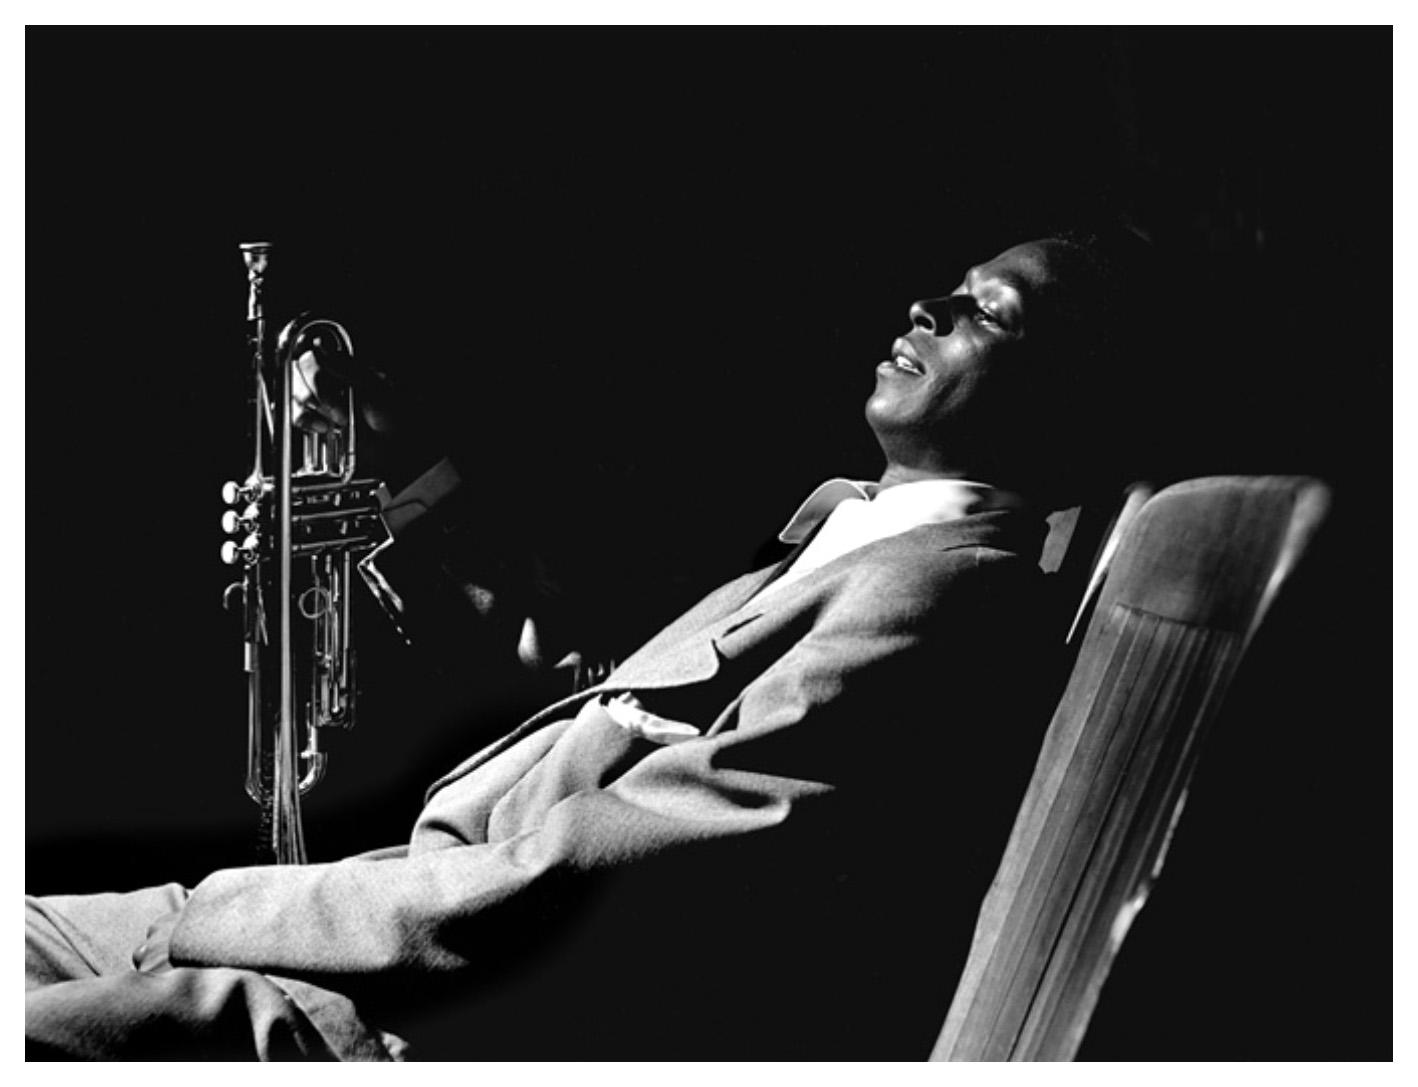 Miles Davis, backstage at 'Just Jazz' concert, Los Angeles, 1950